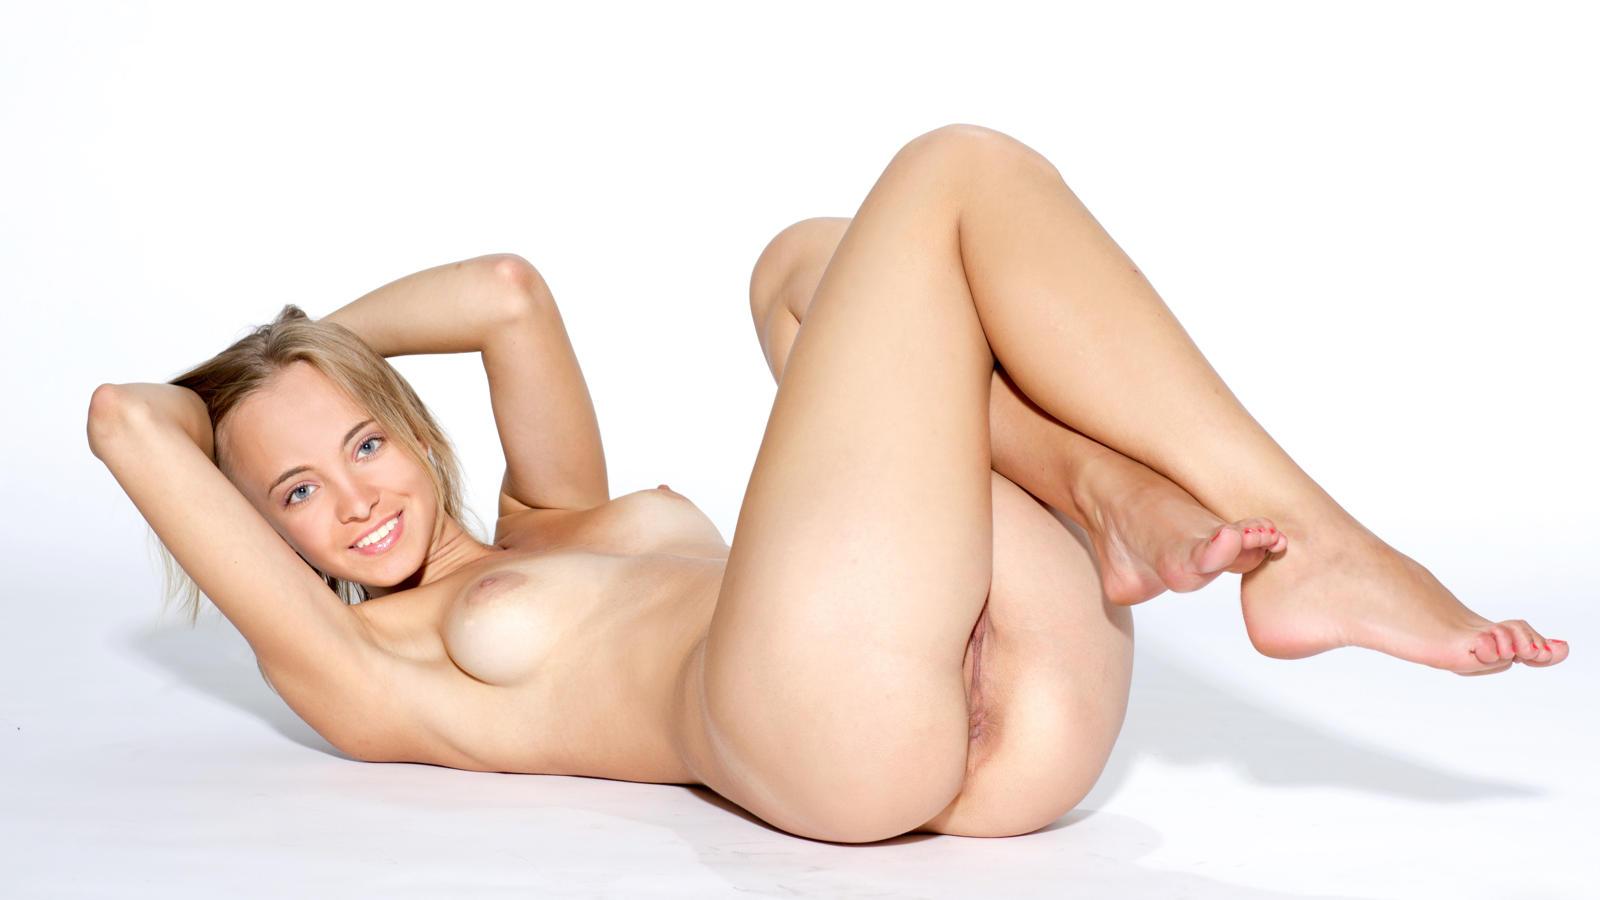 That Fucke hot girl model